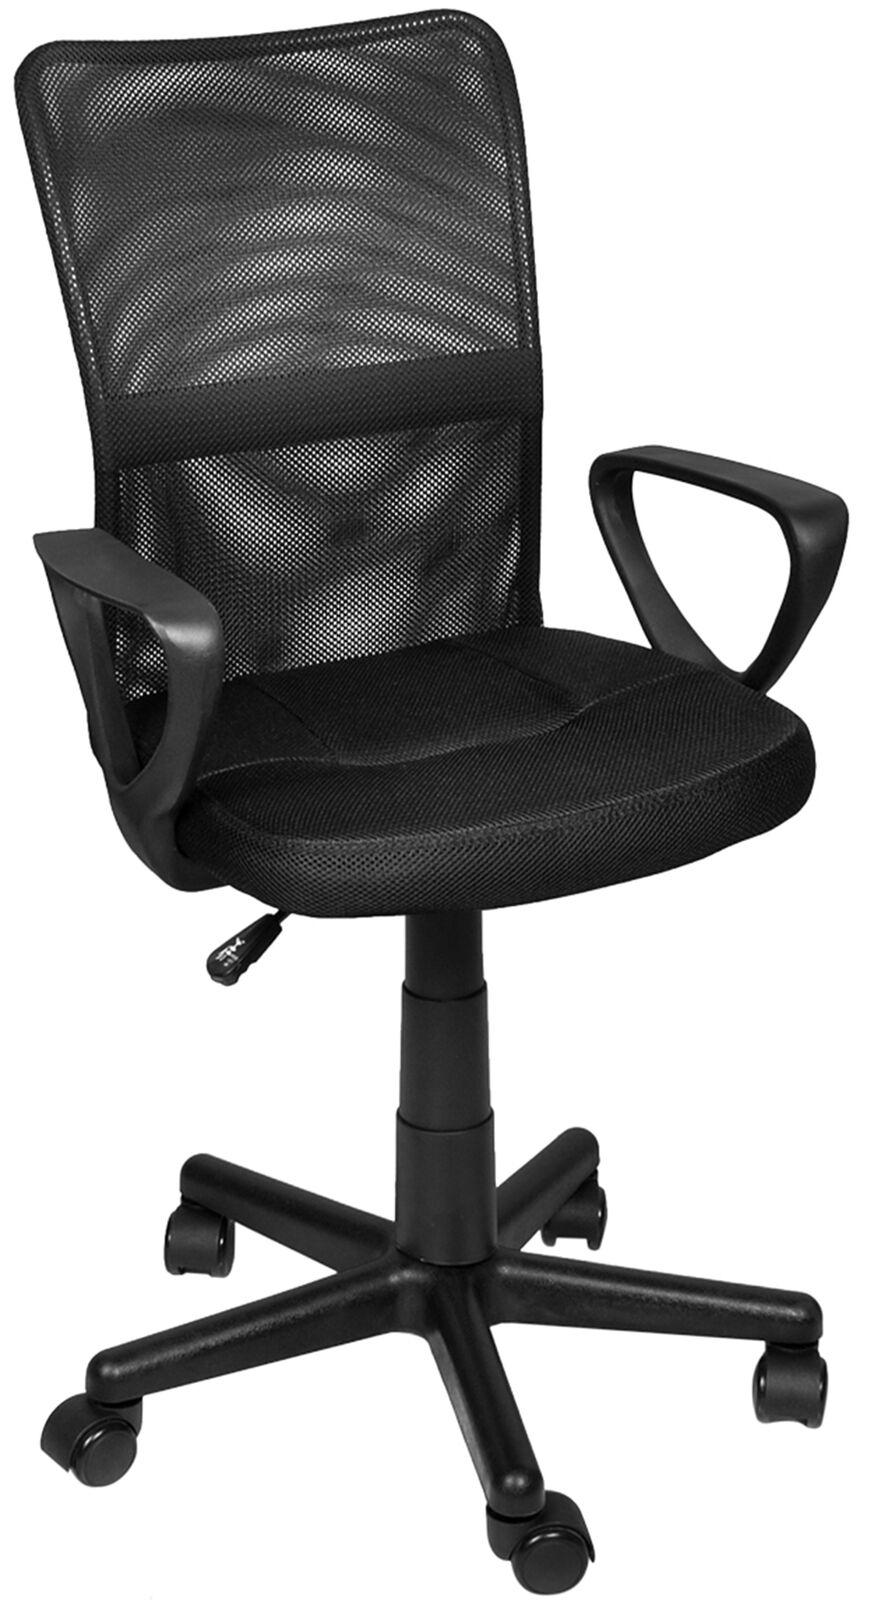 Bürostuhl Ergonomisch Schreibtischstuhl Drehstuhl Computerstuh 8986